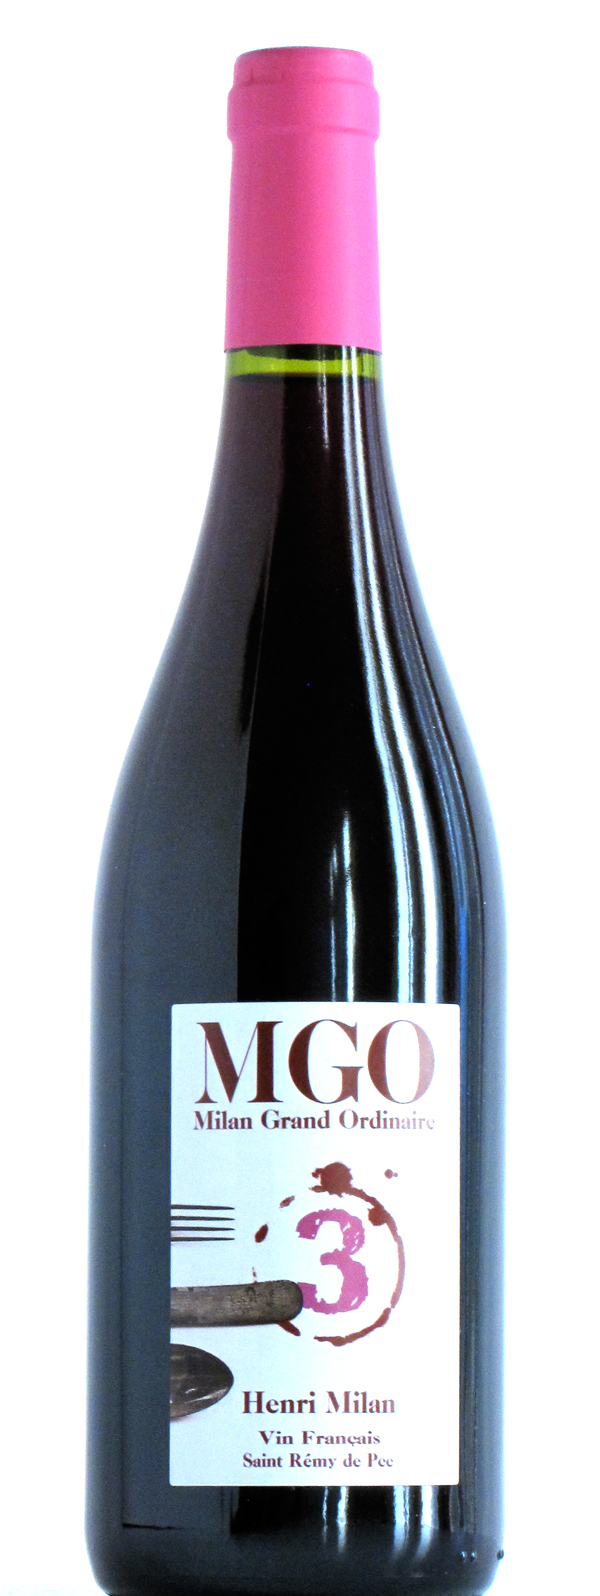 M.G.O Rouge - Domaine Milan